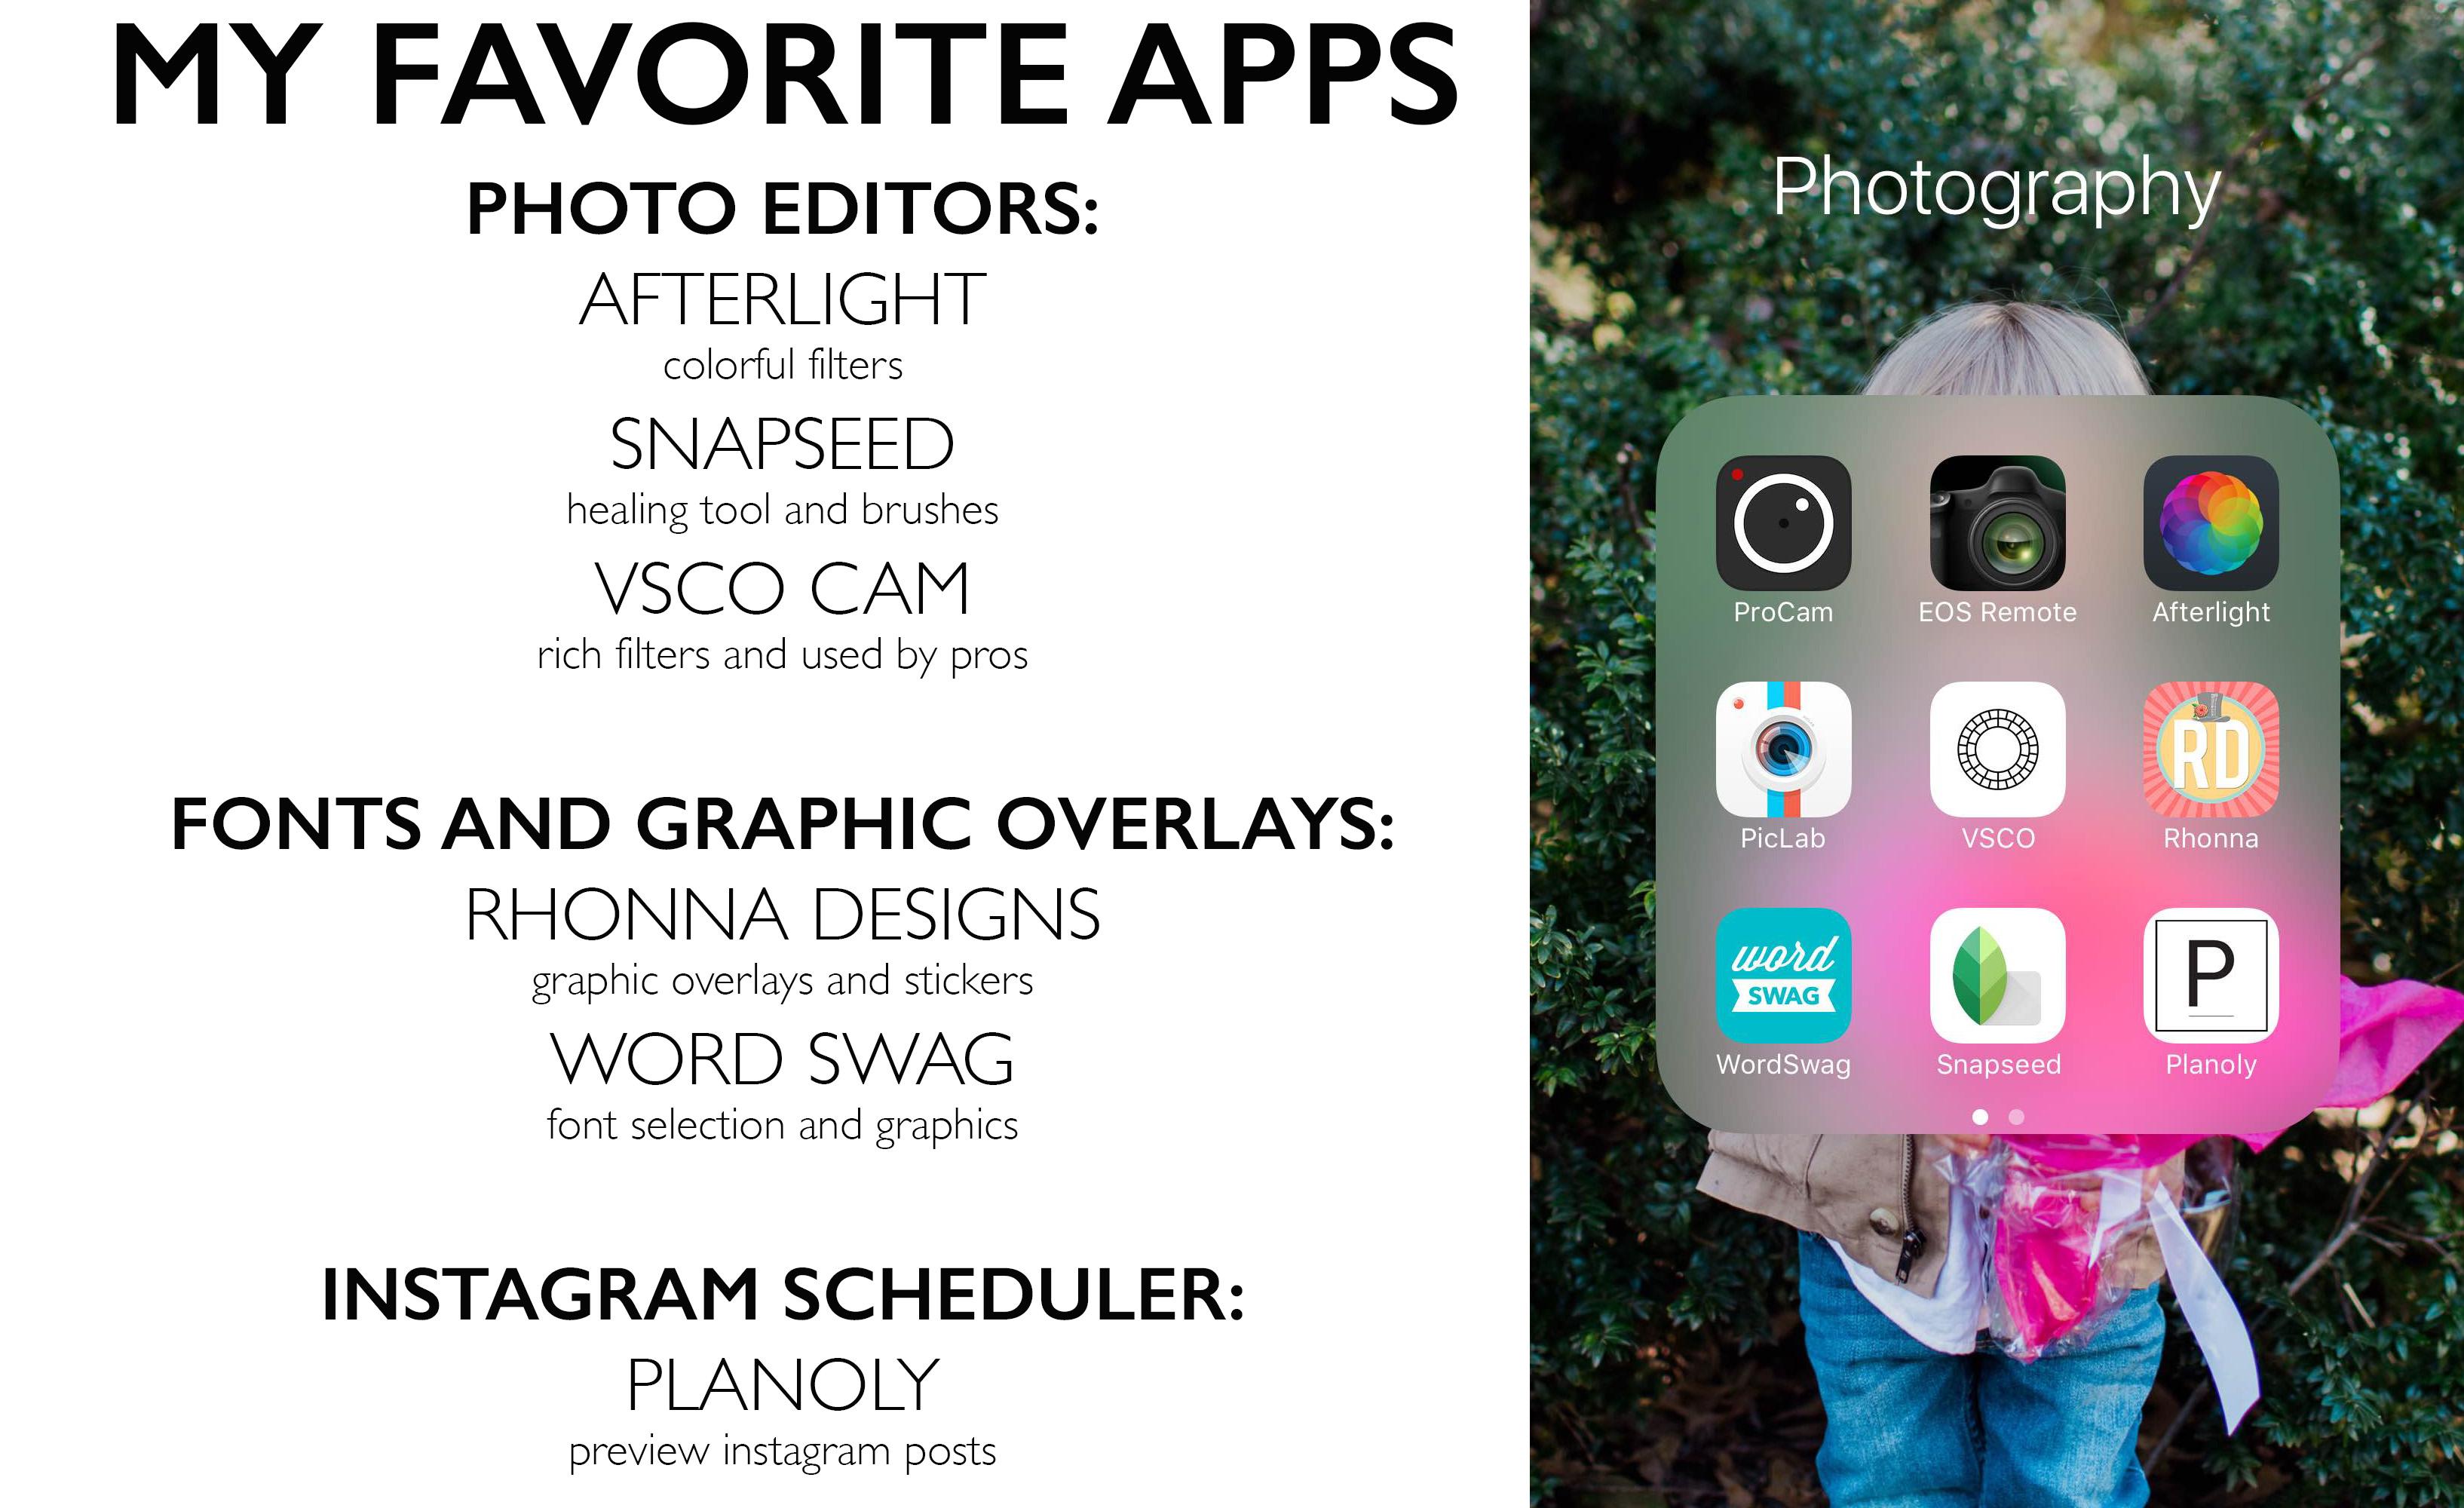 MWOA july favorite apps image